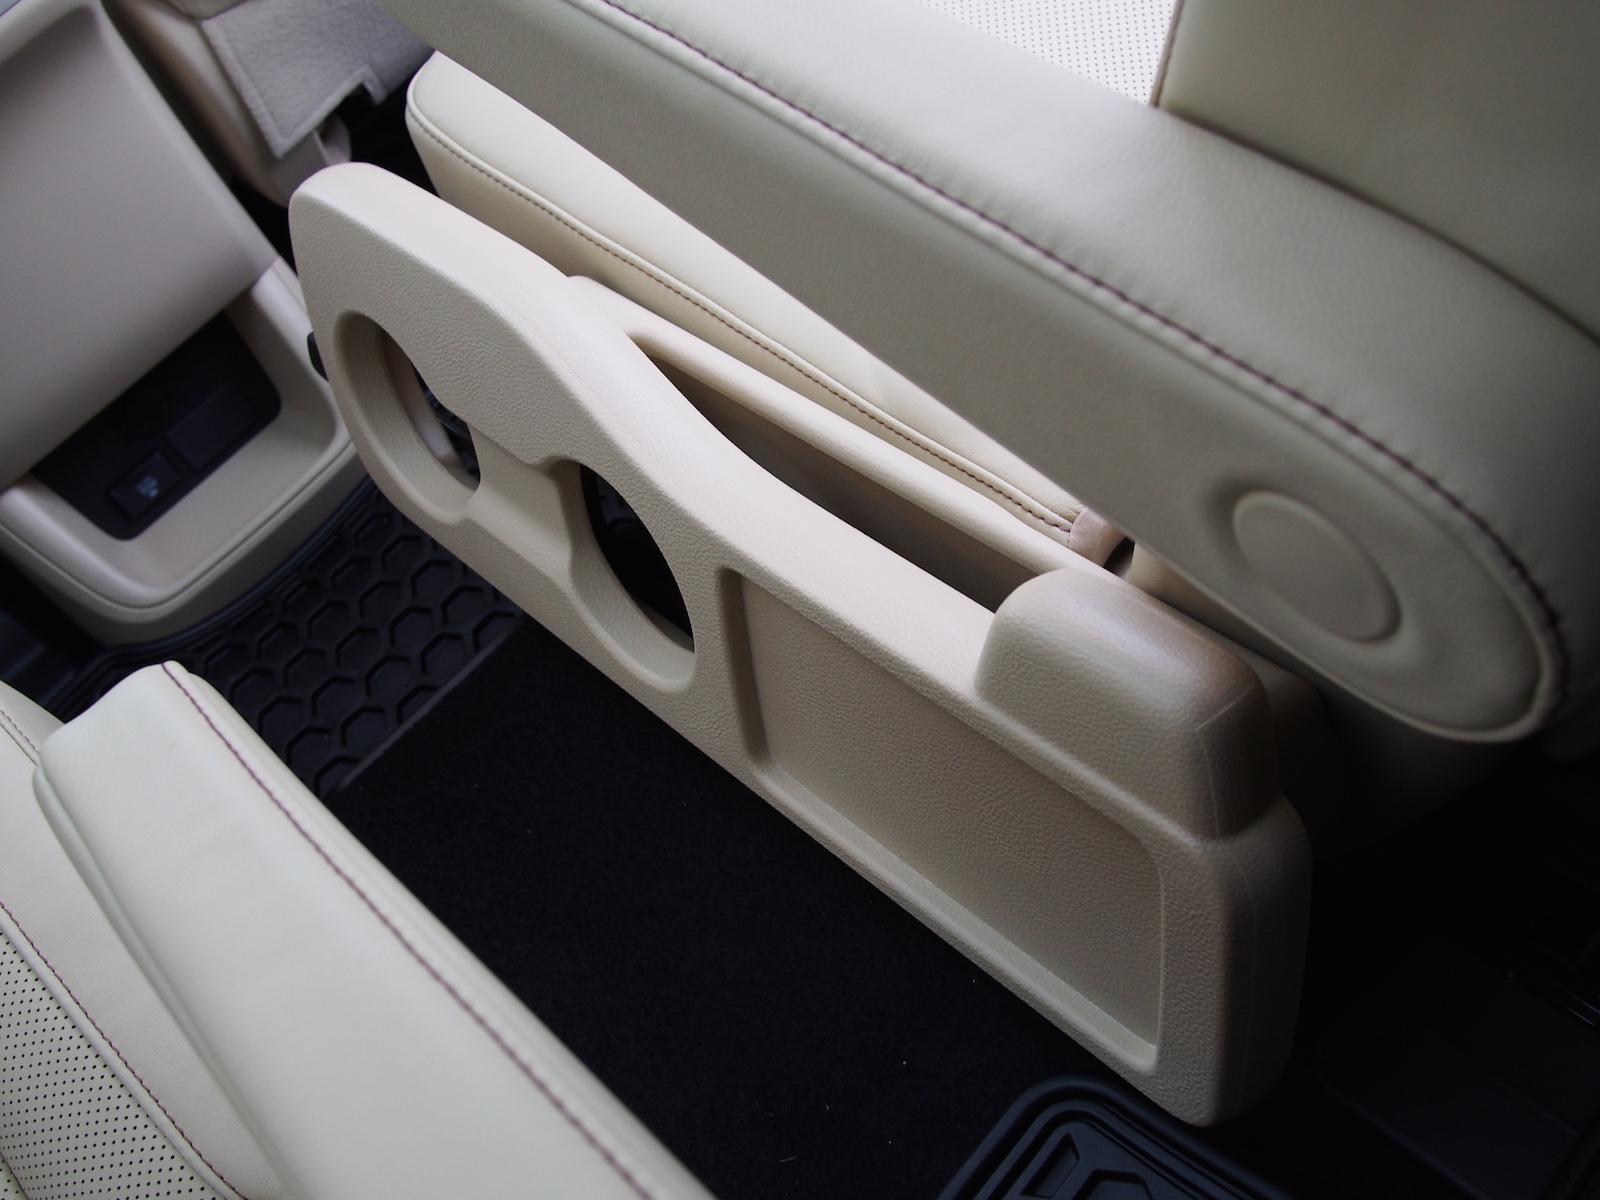 toyota highlander hybrid rear seat captain chair cup holder